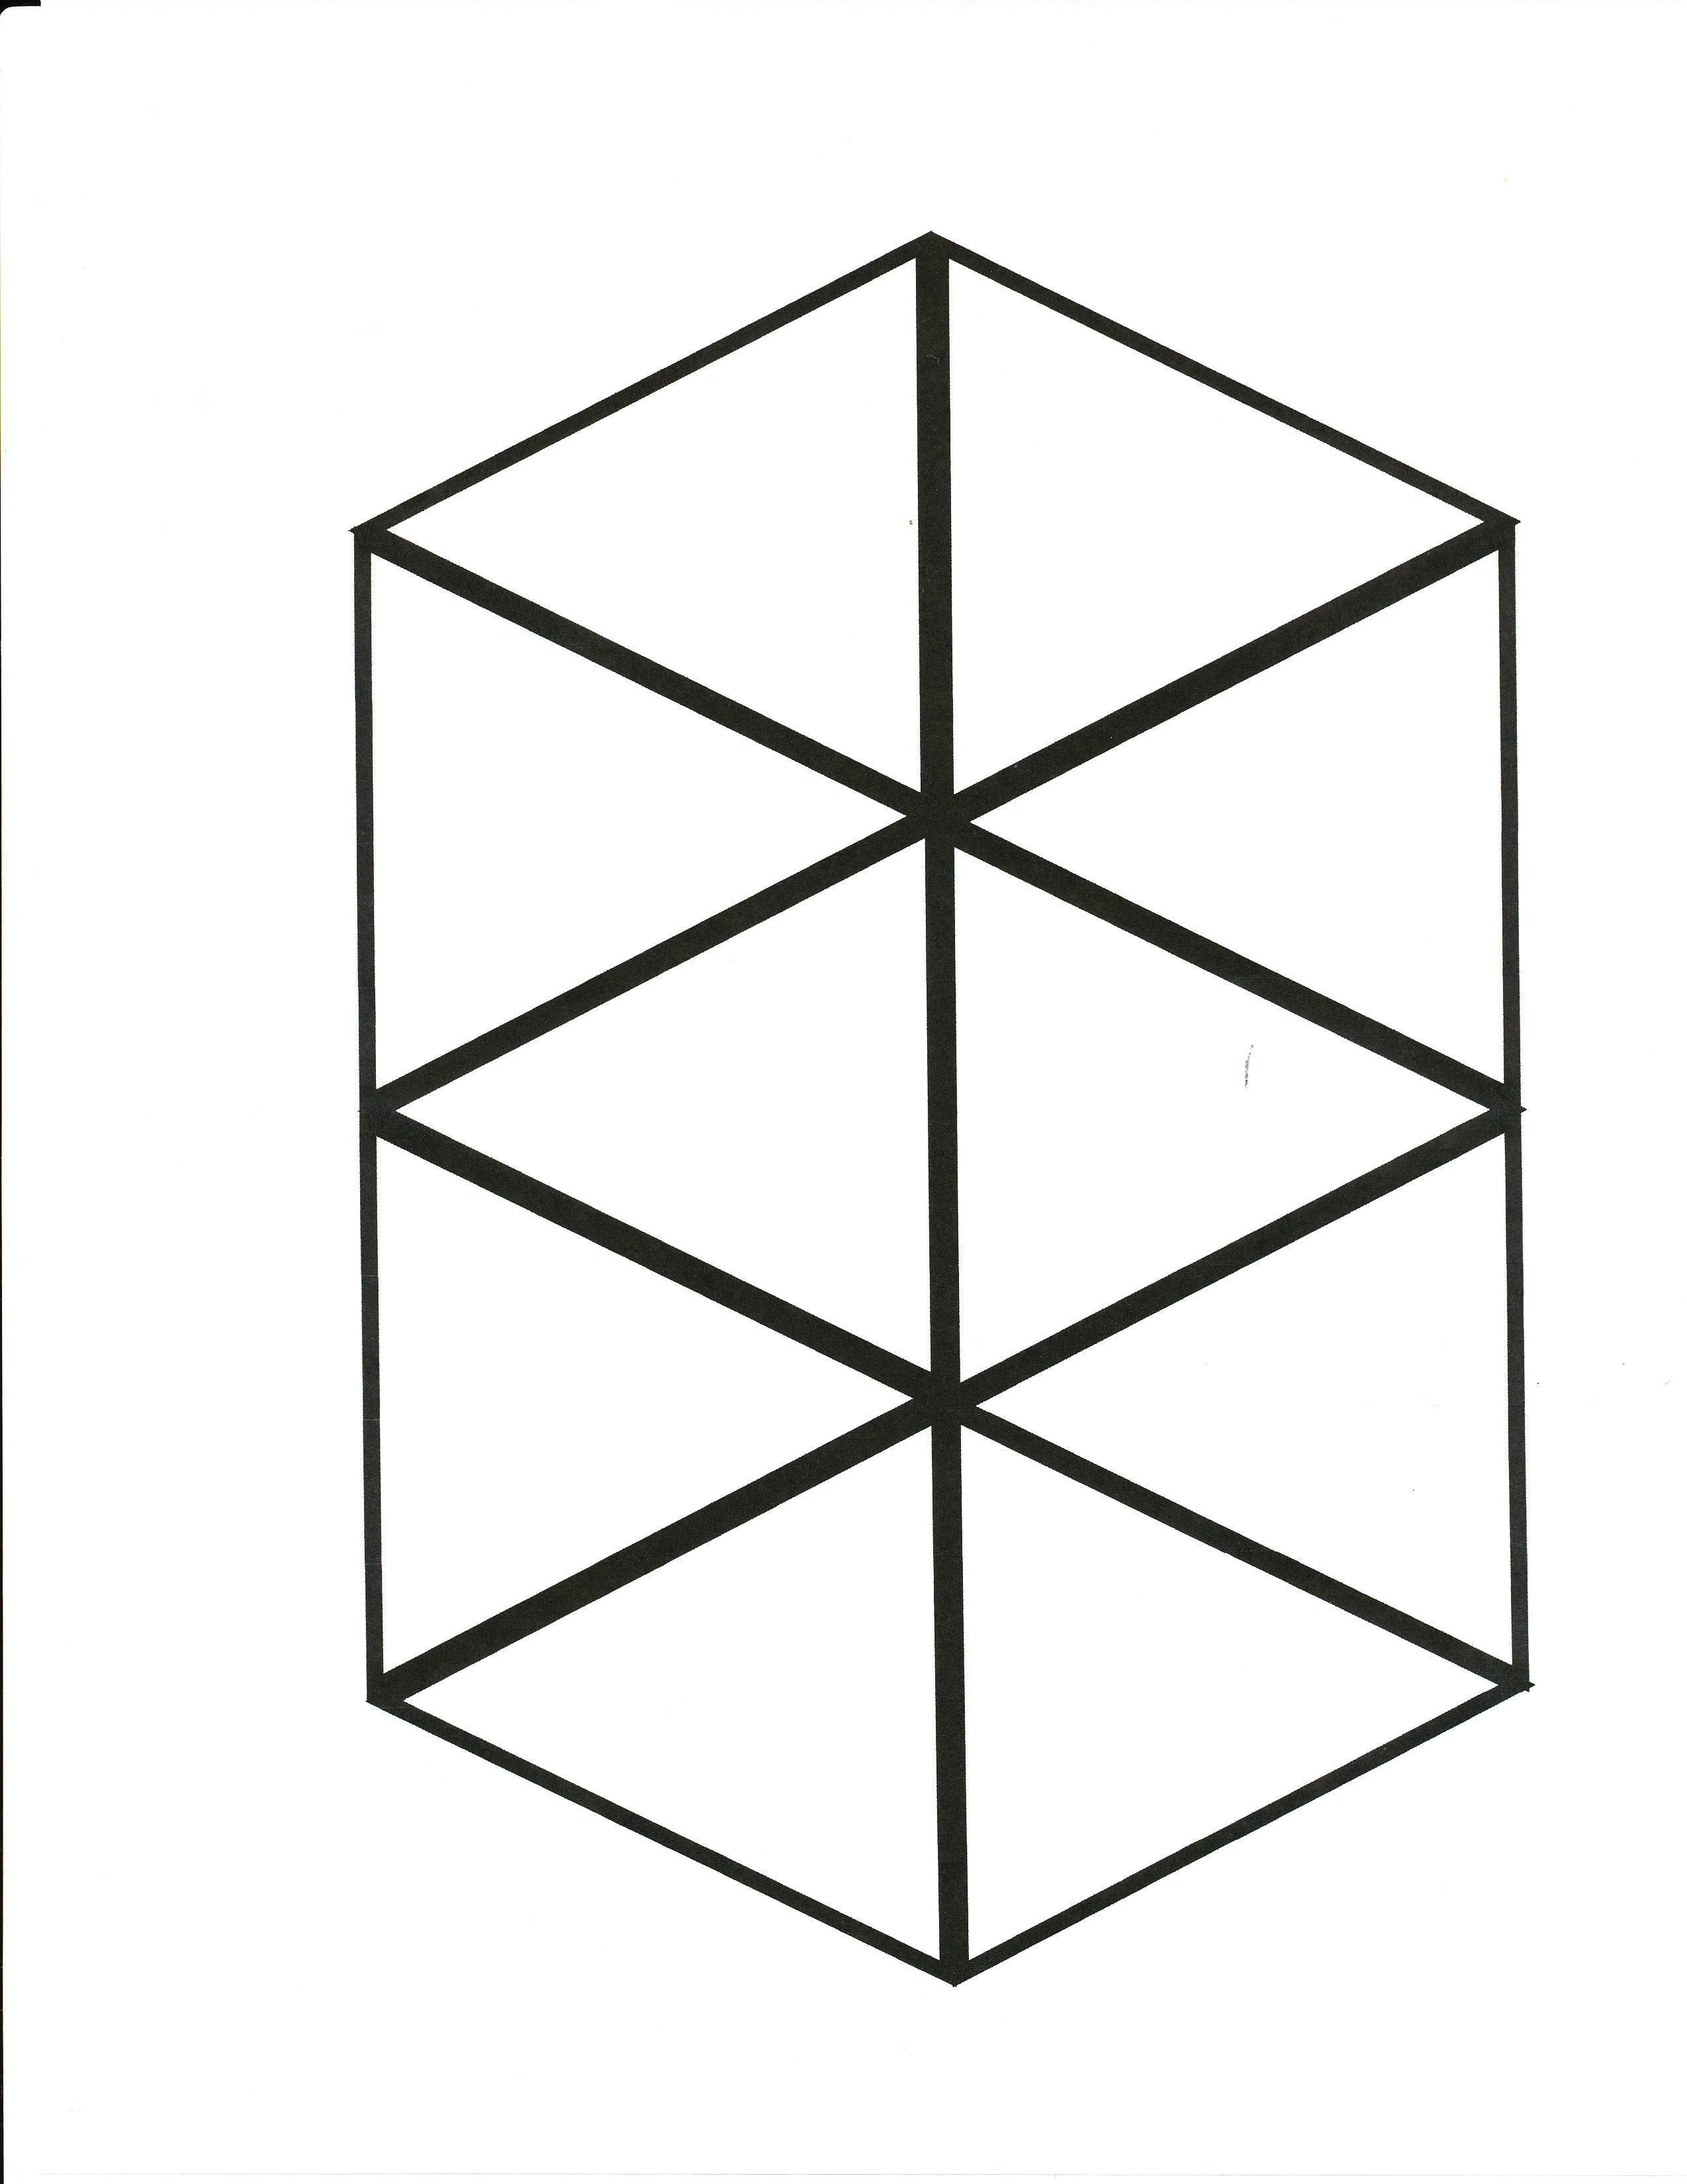 6Th Grade Integer Enrichment - Riverview Enrichment - Printable Tarsia Puzzle